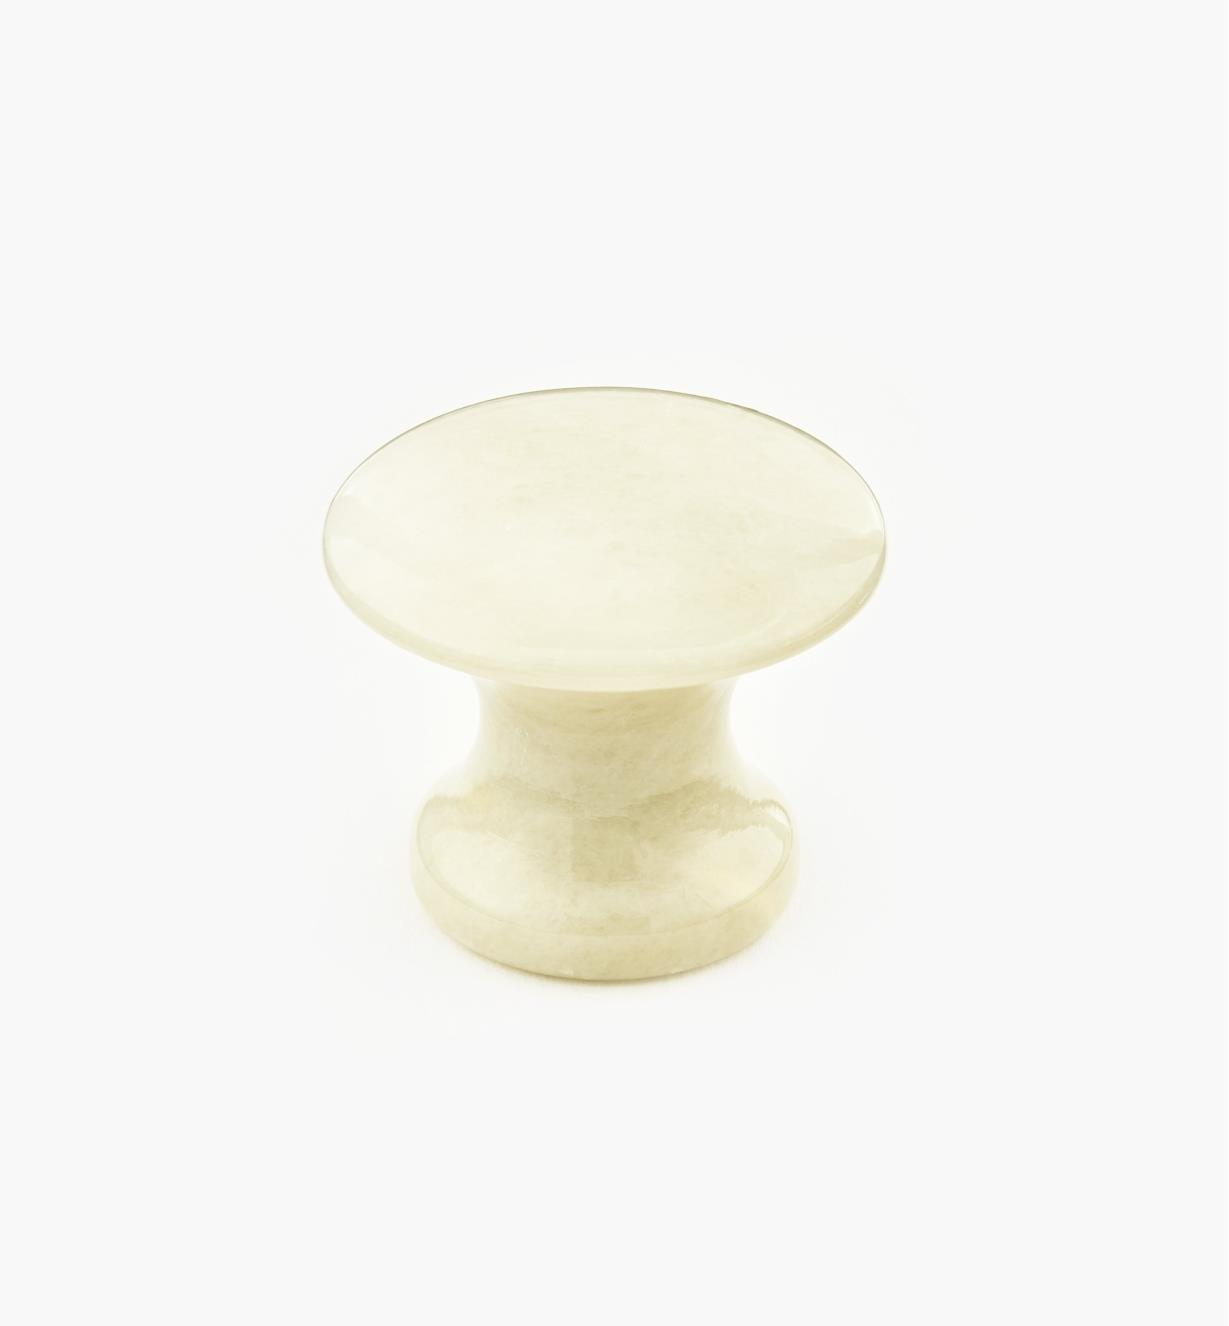 00W4064 - White Marble Knob, 35mm x 30mm